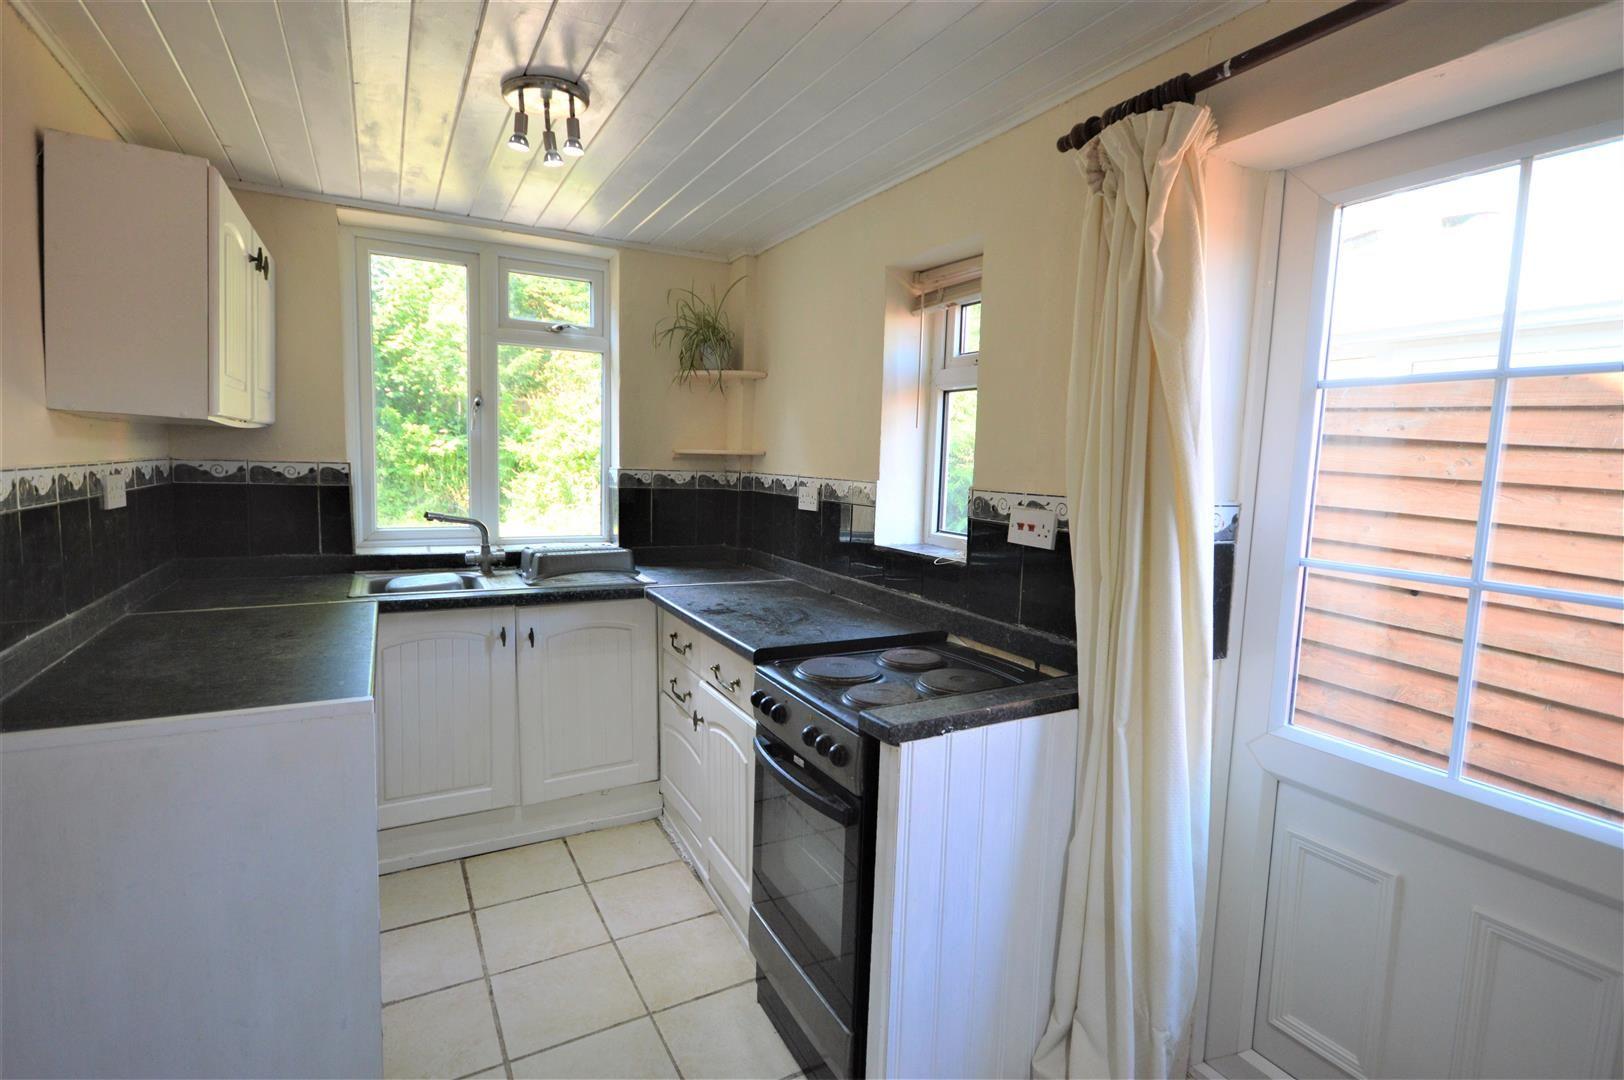 4 bed semi-detached for sale in Presteigne 7